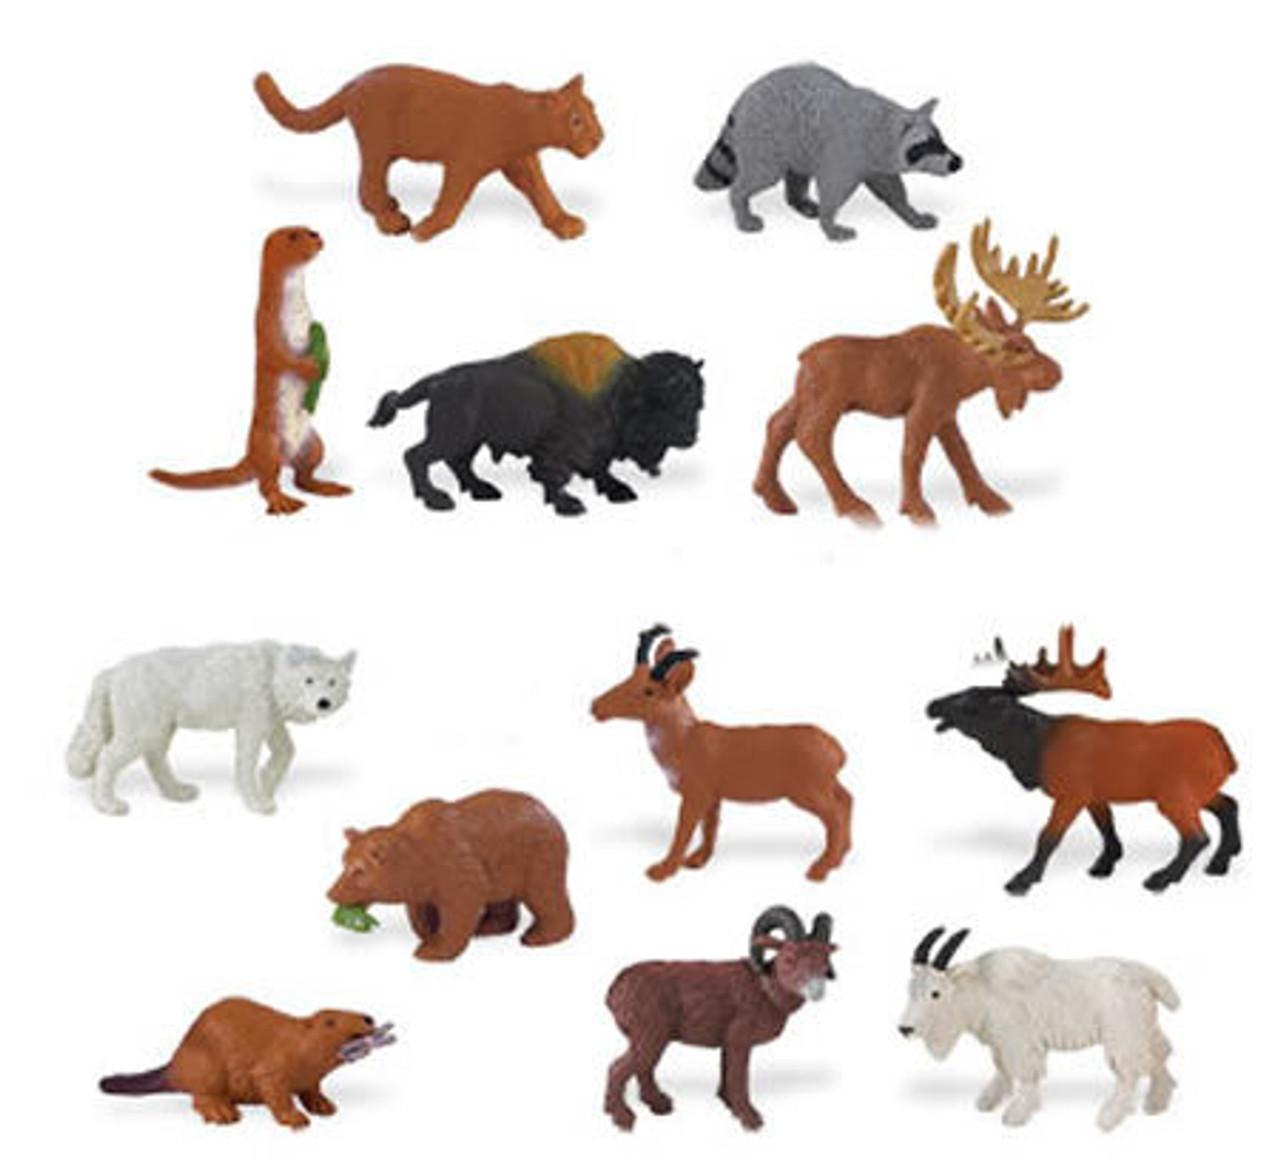 Small Miniature Animals & People Figures